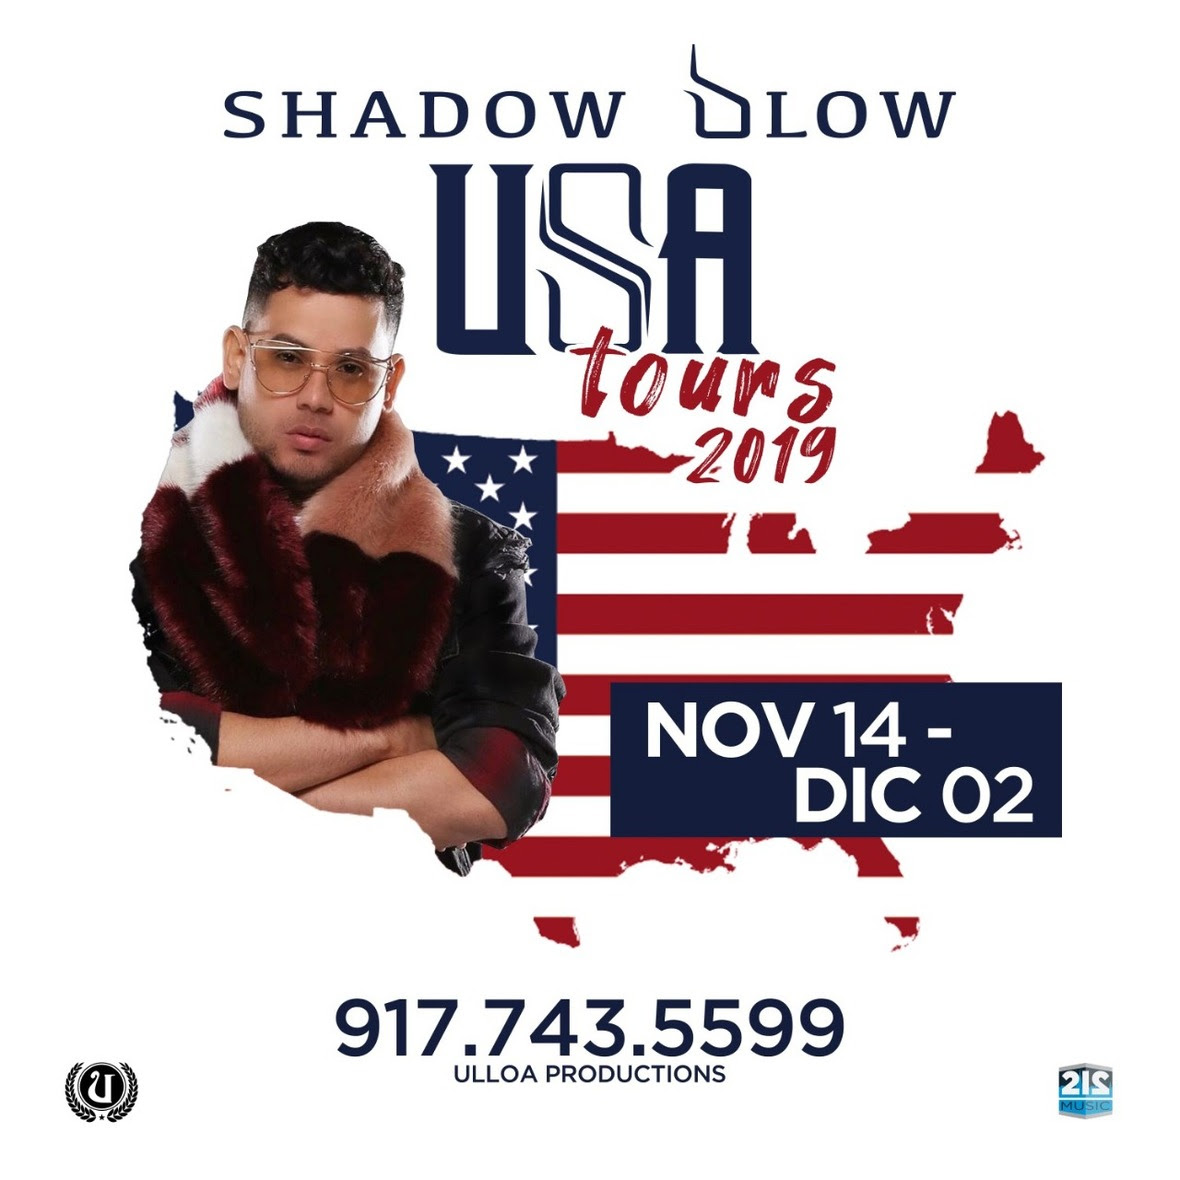 ShadowBlow1